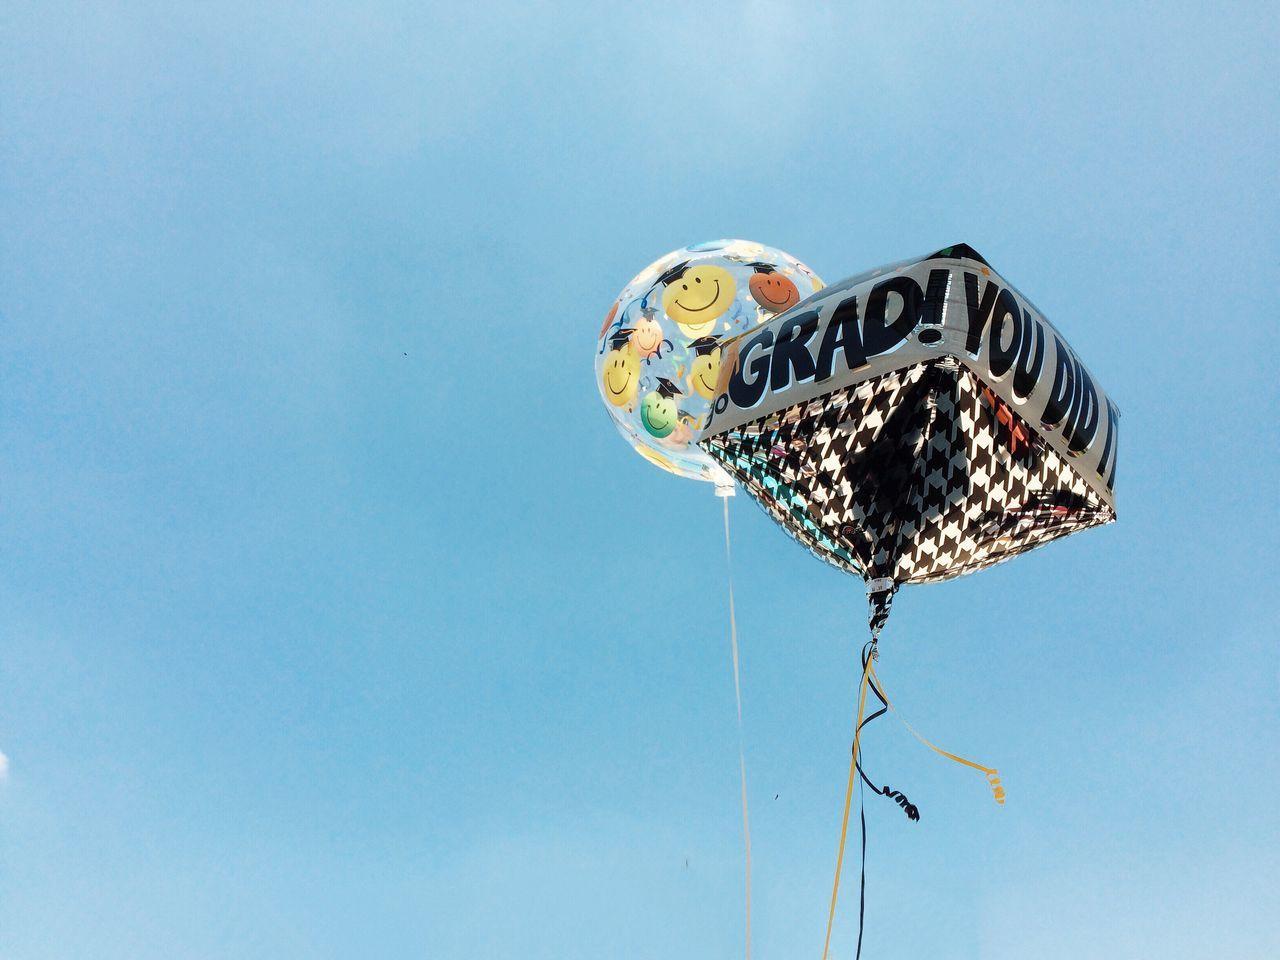 Beautiful stock photos of abschluss, Anthropomorphic Face, Anthropomorphic Smiley Face, Balloon, Celebration